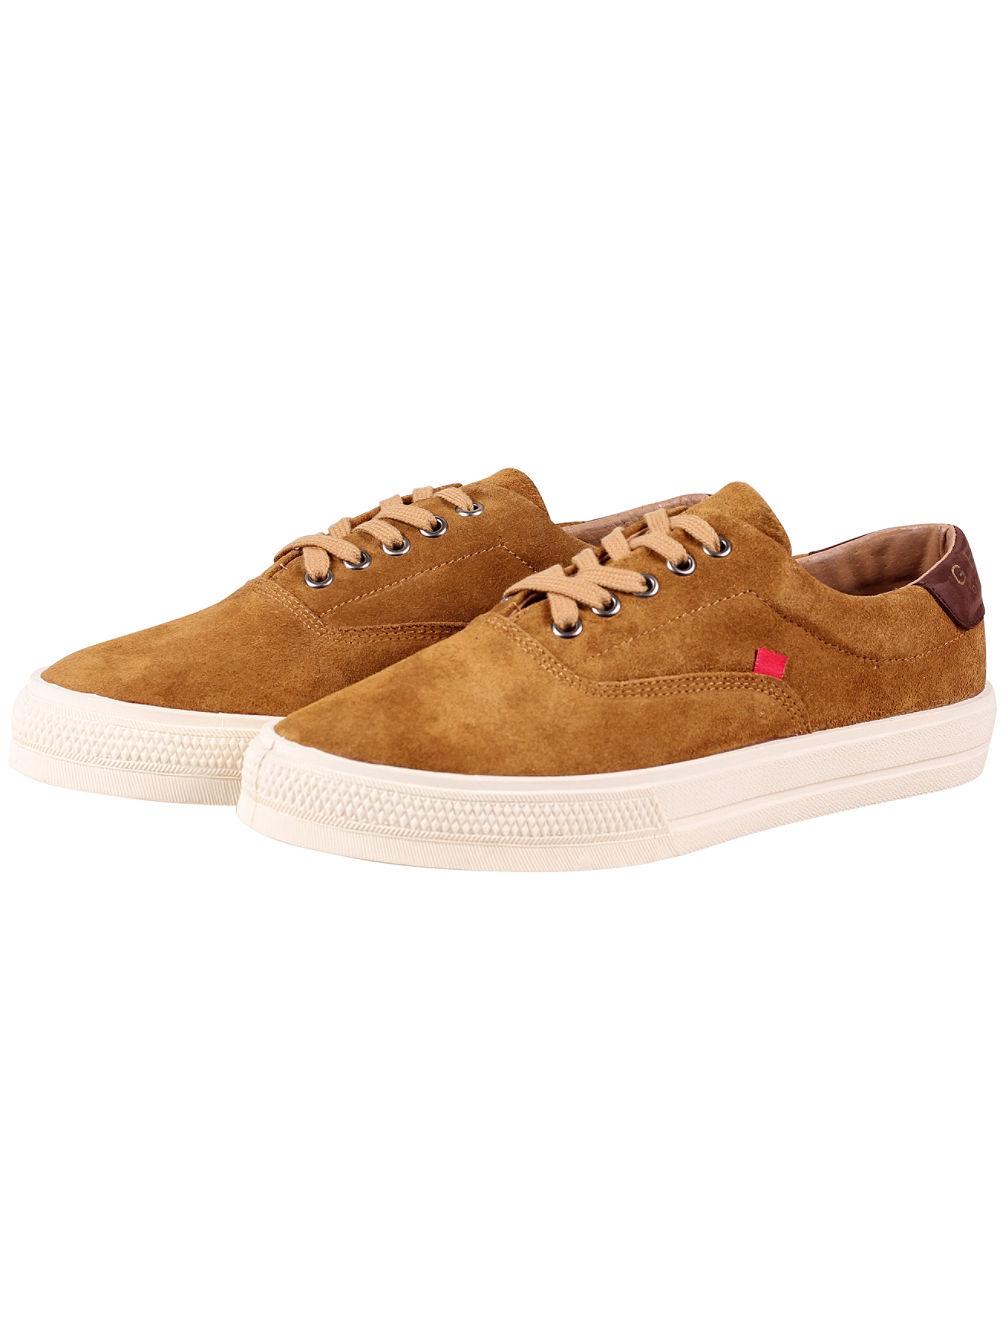 Djinns Sub Age Lux Sneakers